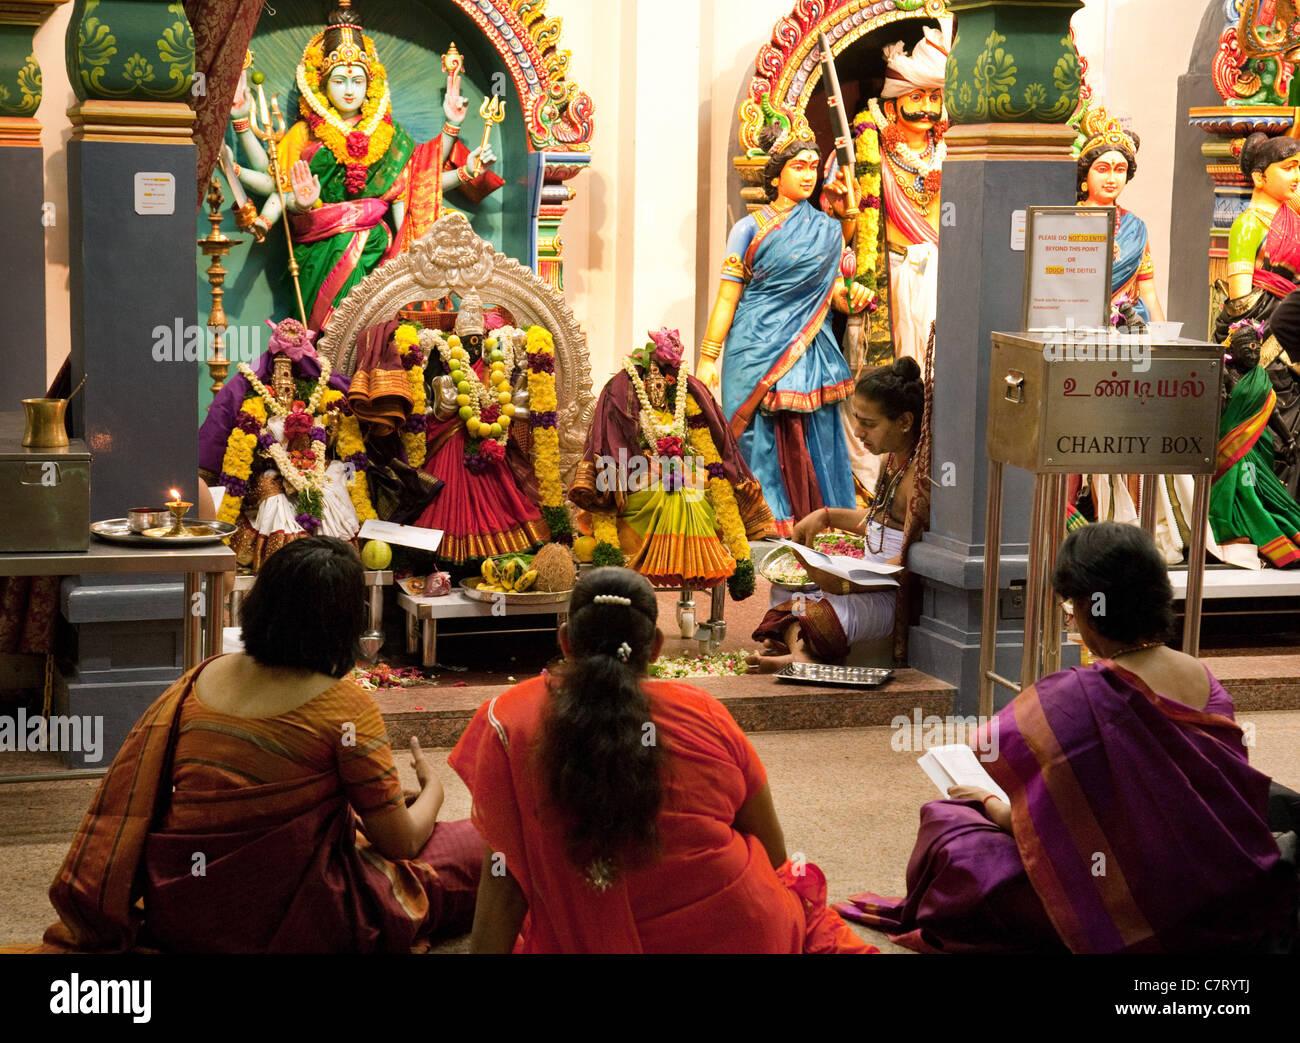 Hindu Worshippers And Deities Inside The Sri Mariamman ...